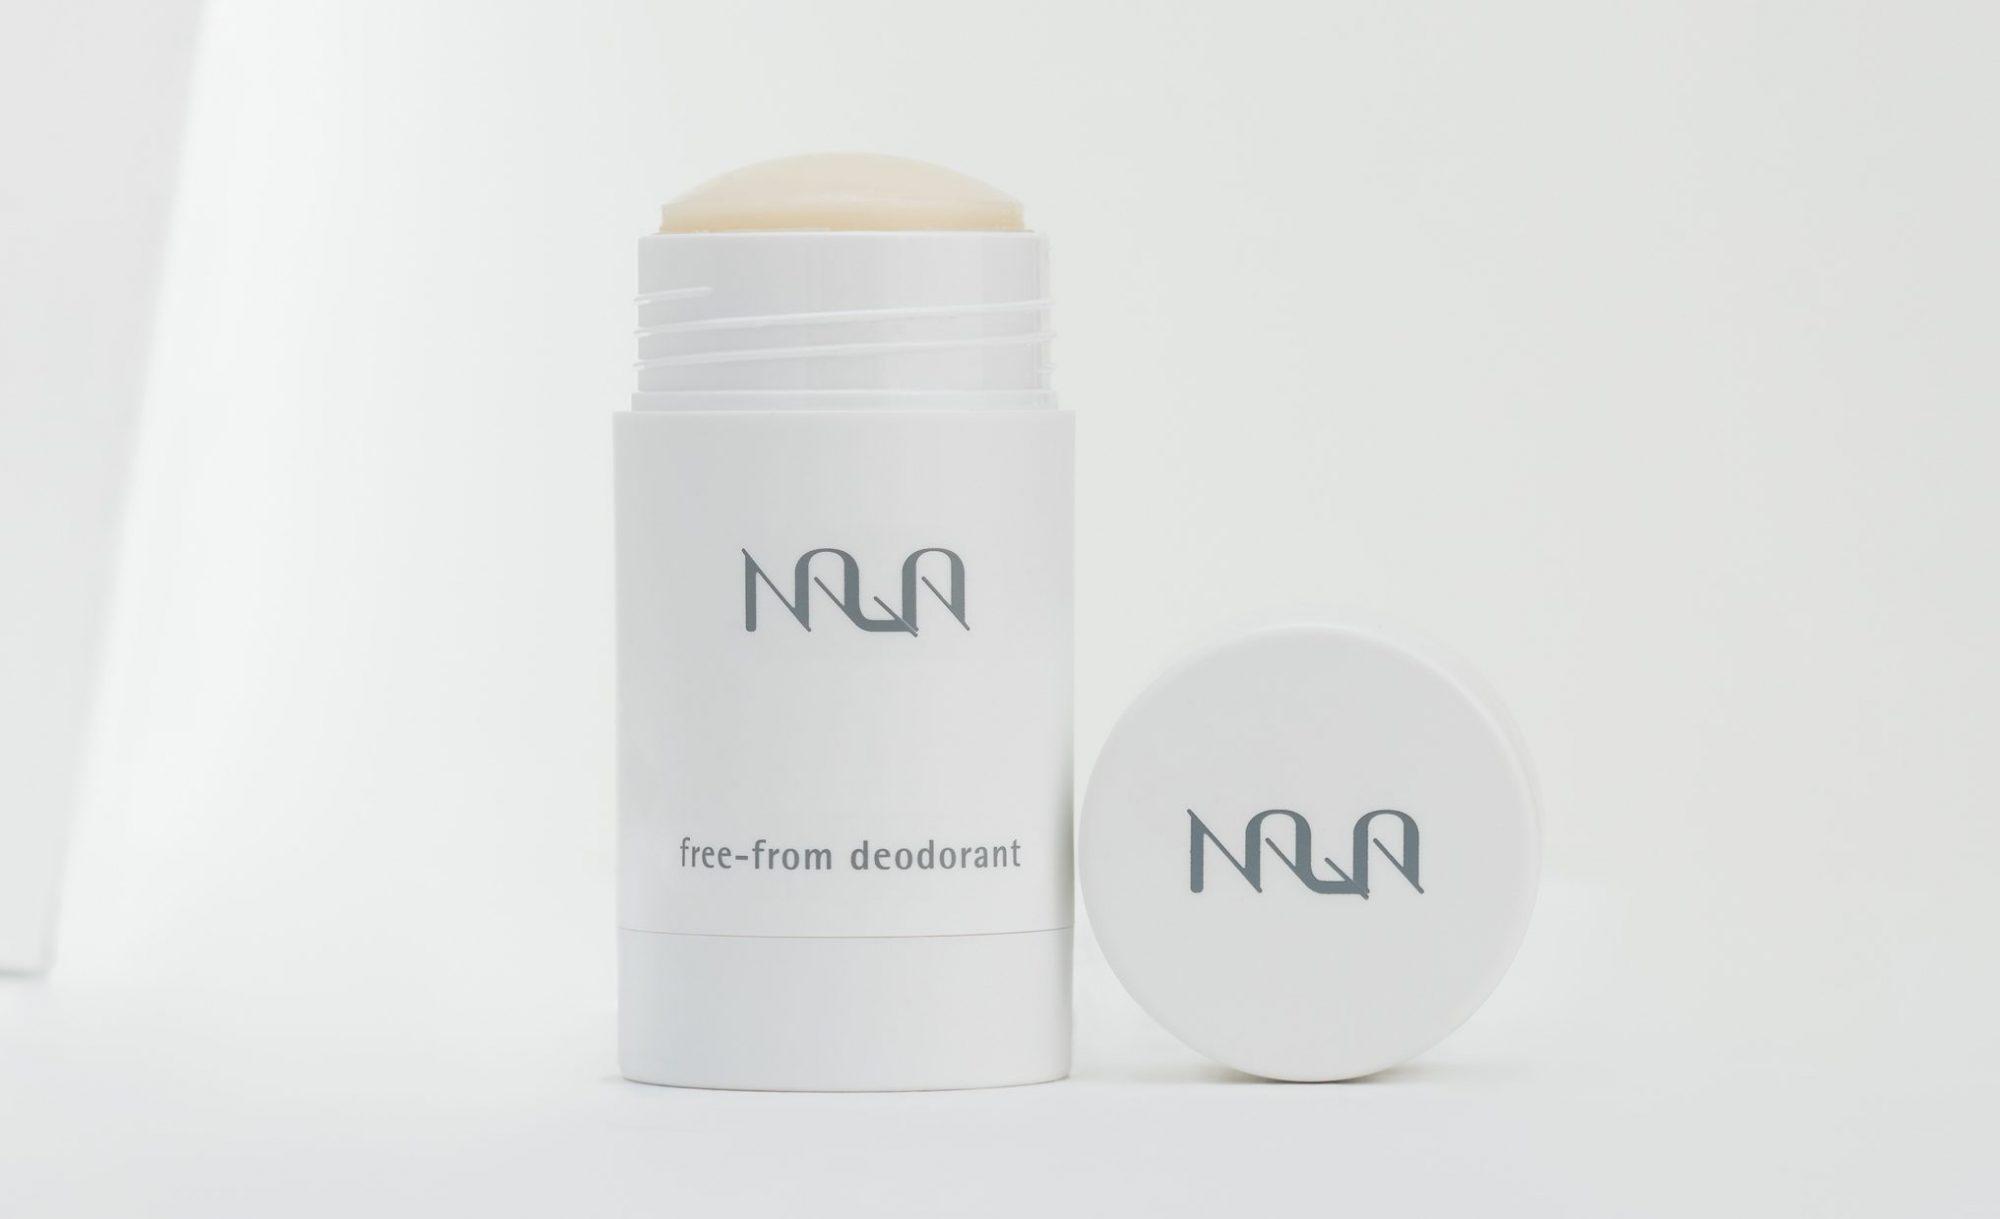 NalaPersonalizedDeodorant-InnerPackaging-e1572617416591.jpg